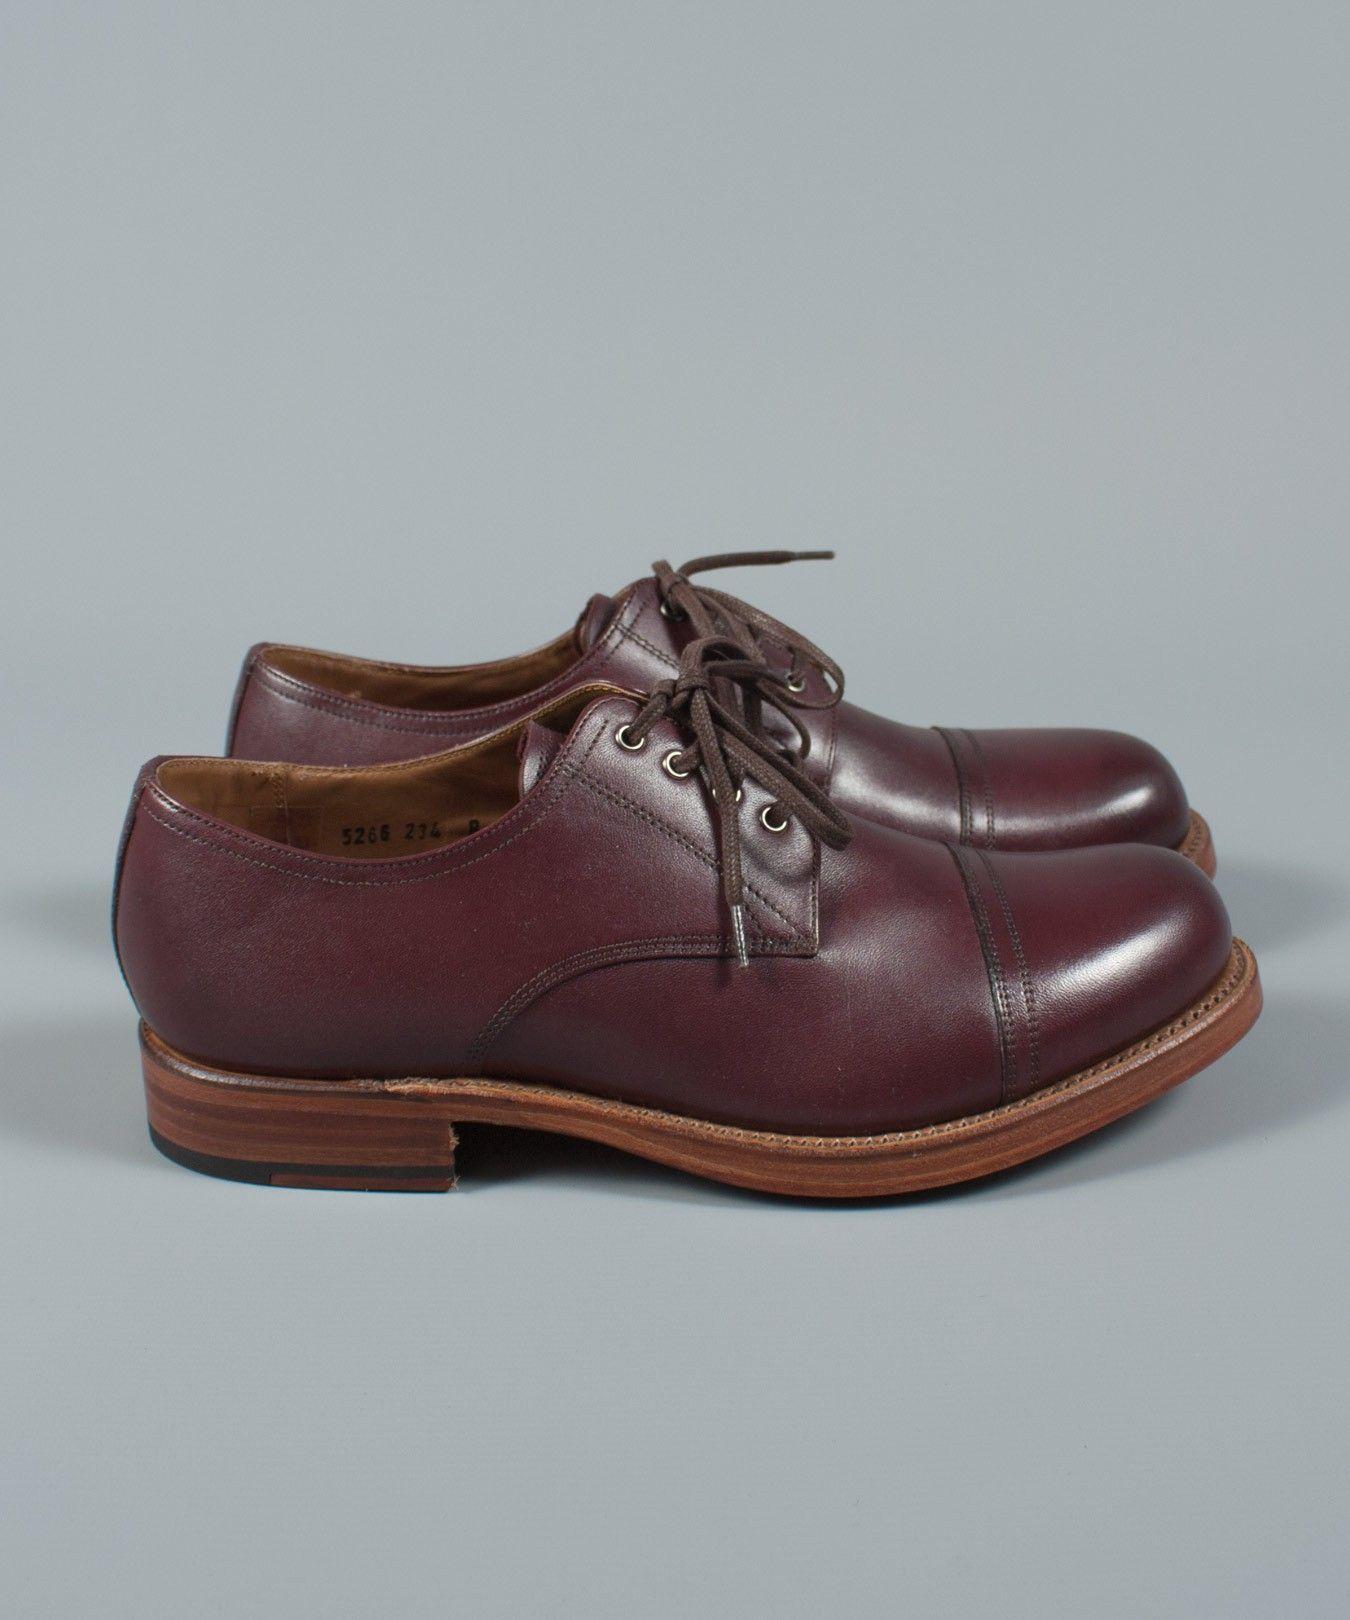 Grenson at Weavers Door & Grenson at Weavers Door | Grenson Shoes AW13 | Rhys | Burgundy ... Pezcame.Com